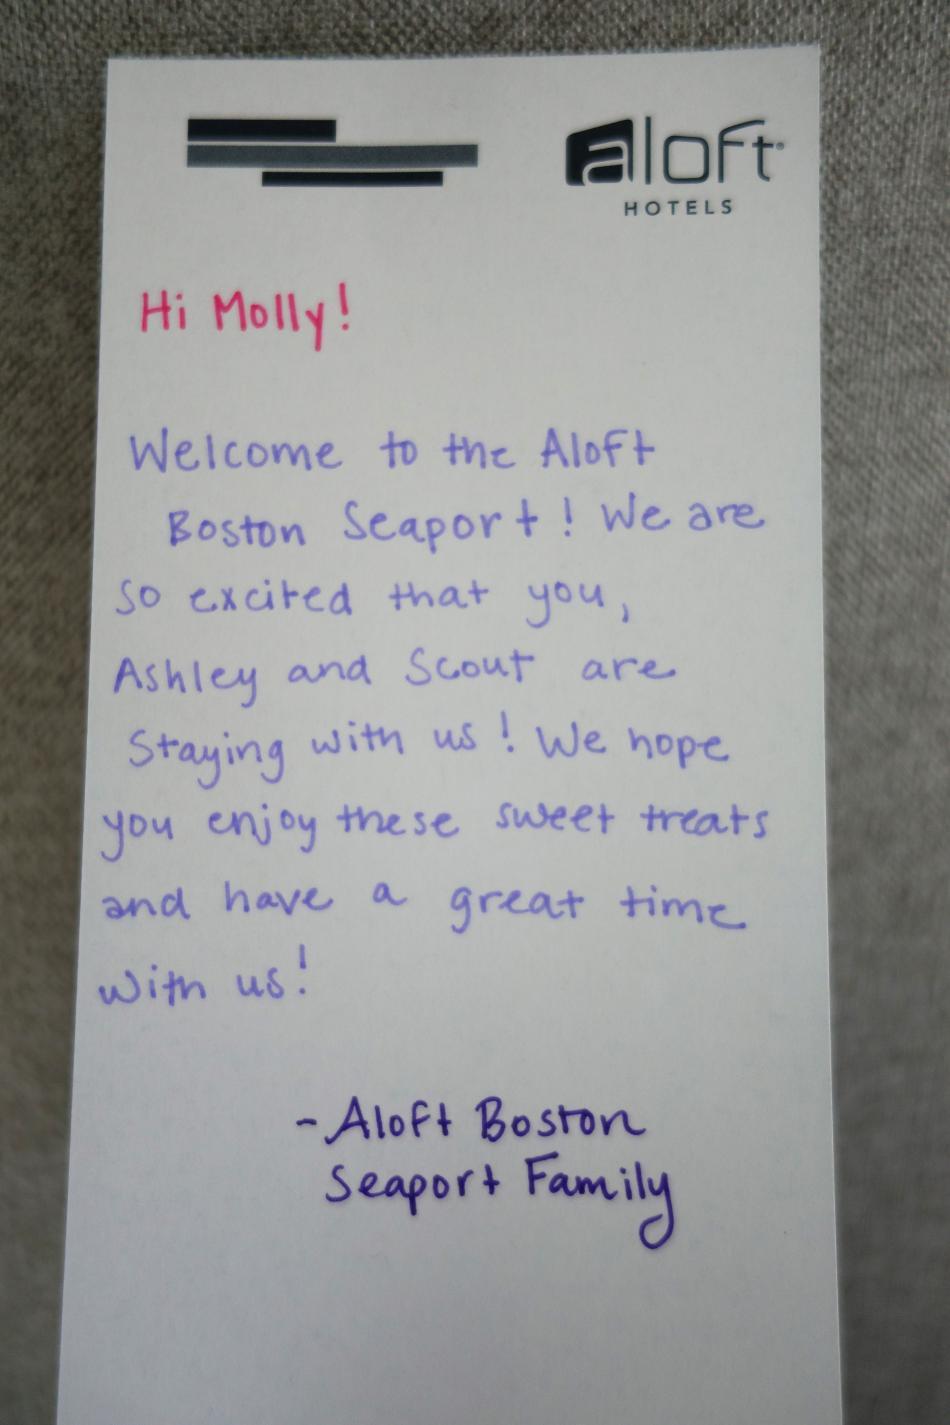 Aloft Boston Seaport